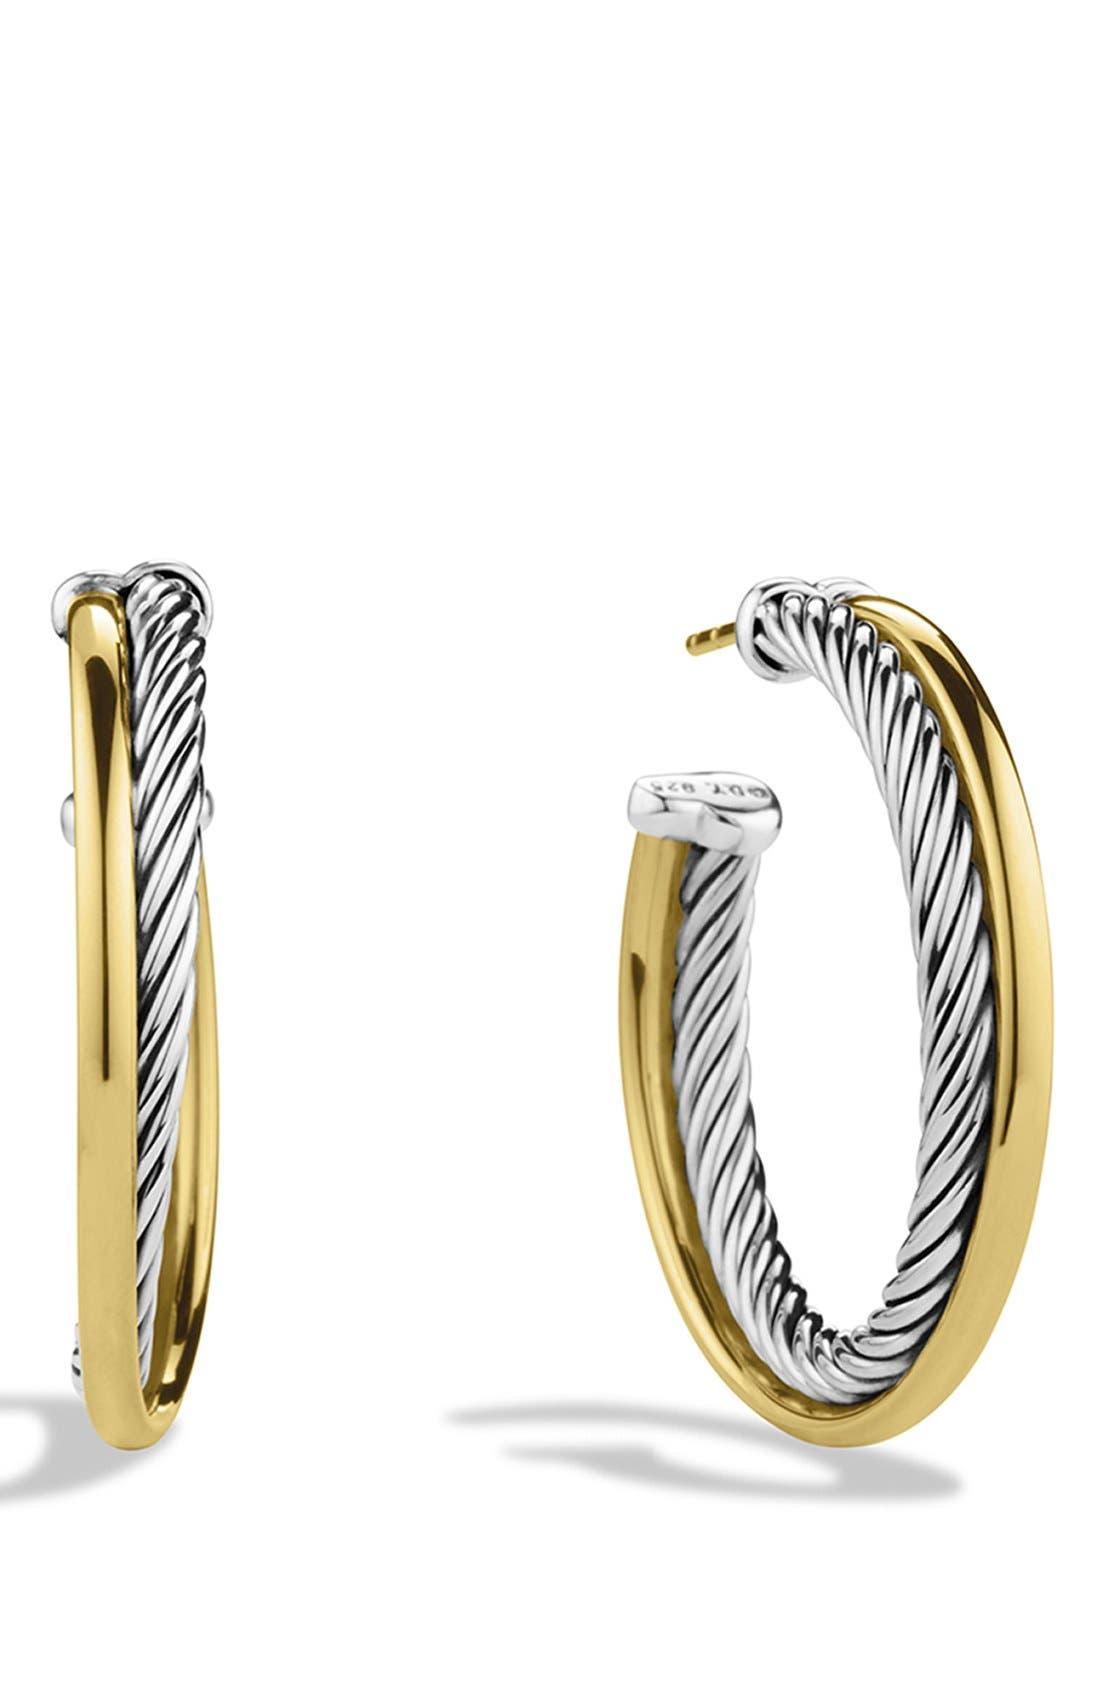 Alternate Image 1 Selected - David Yurman 'Crossover' Medium Hoop Earrings with Gold